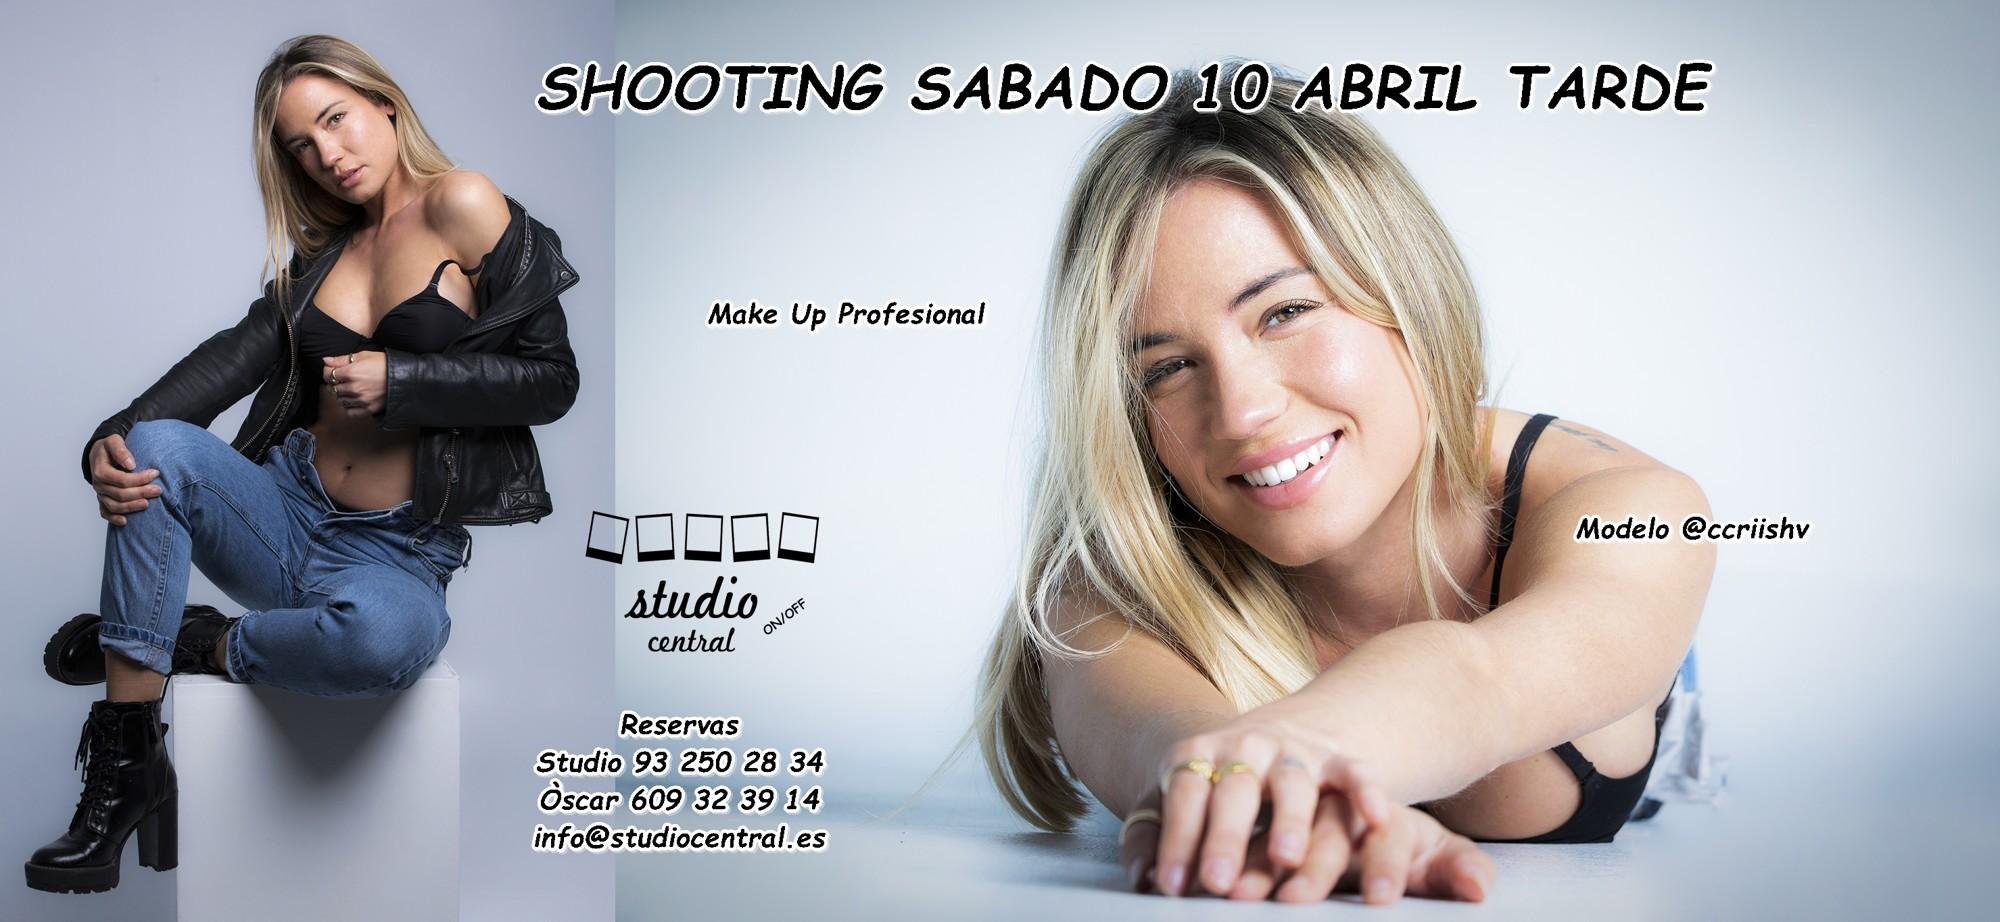 Shooting 10 Abril 2021